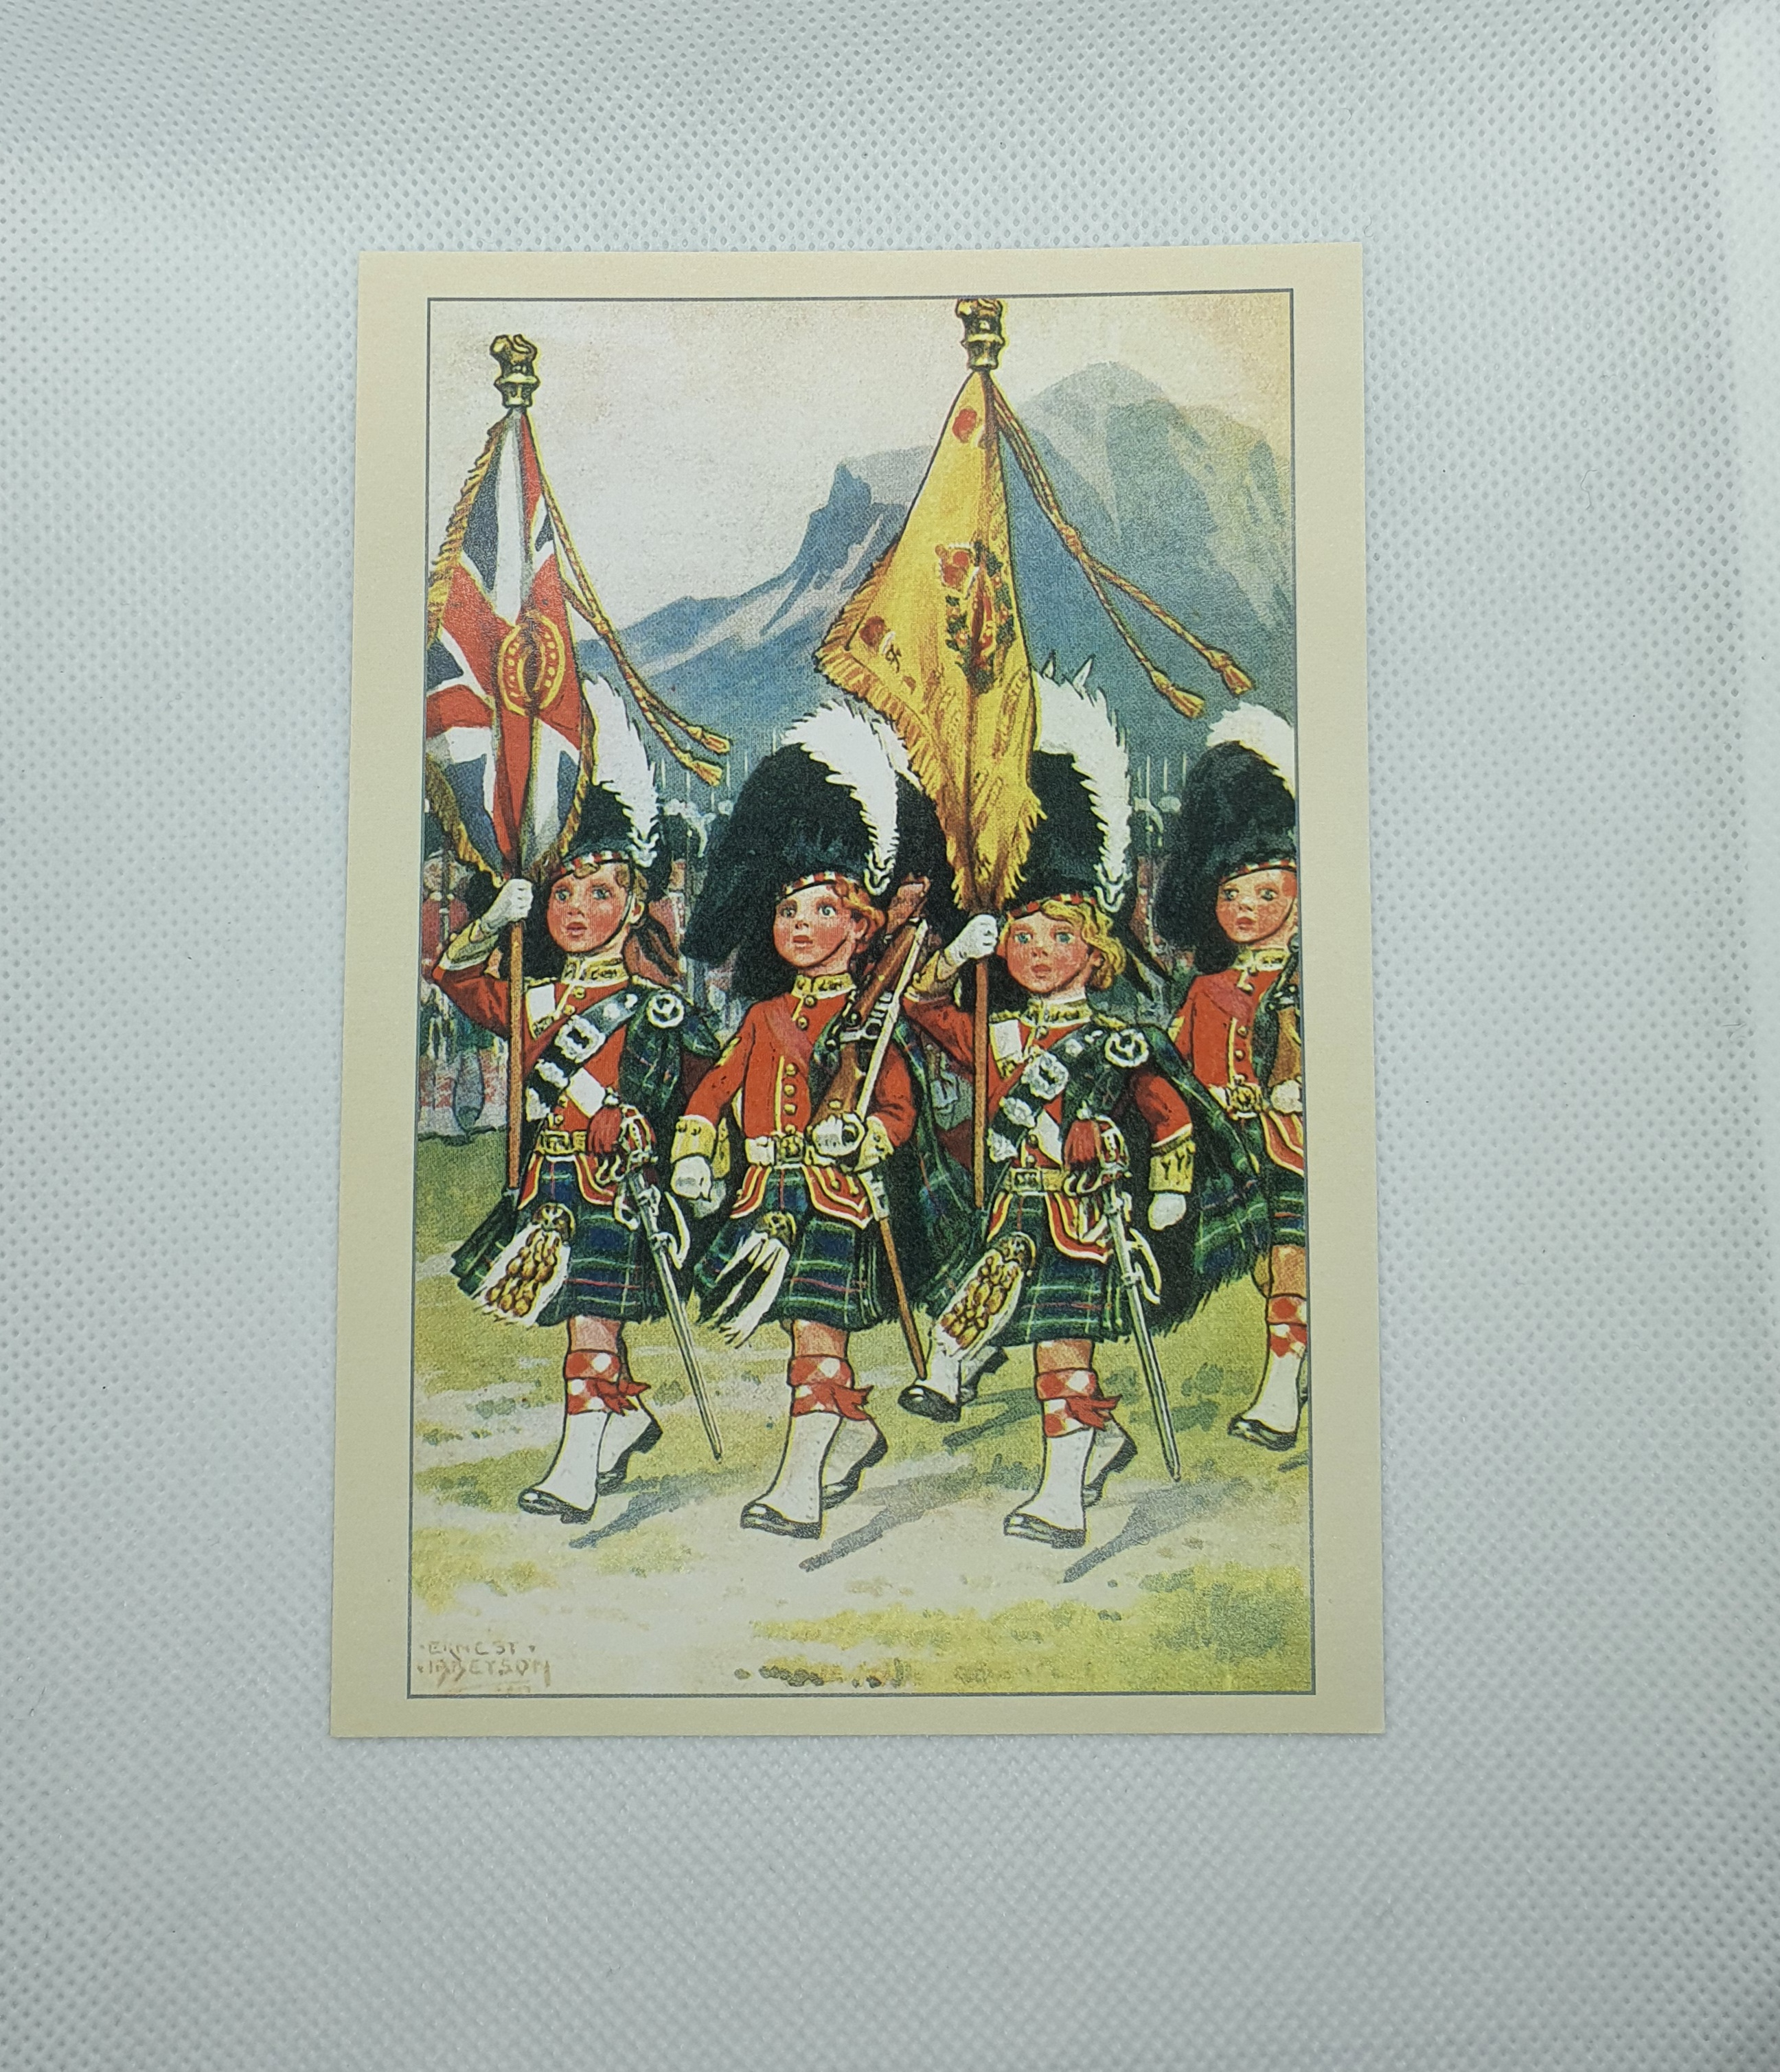 Postcard - 'The Boy Army' Colour Party, Seaforth Highlanders